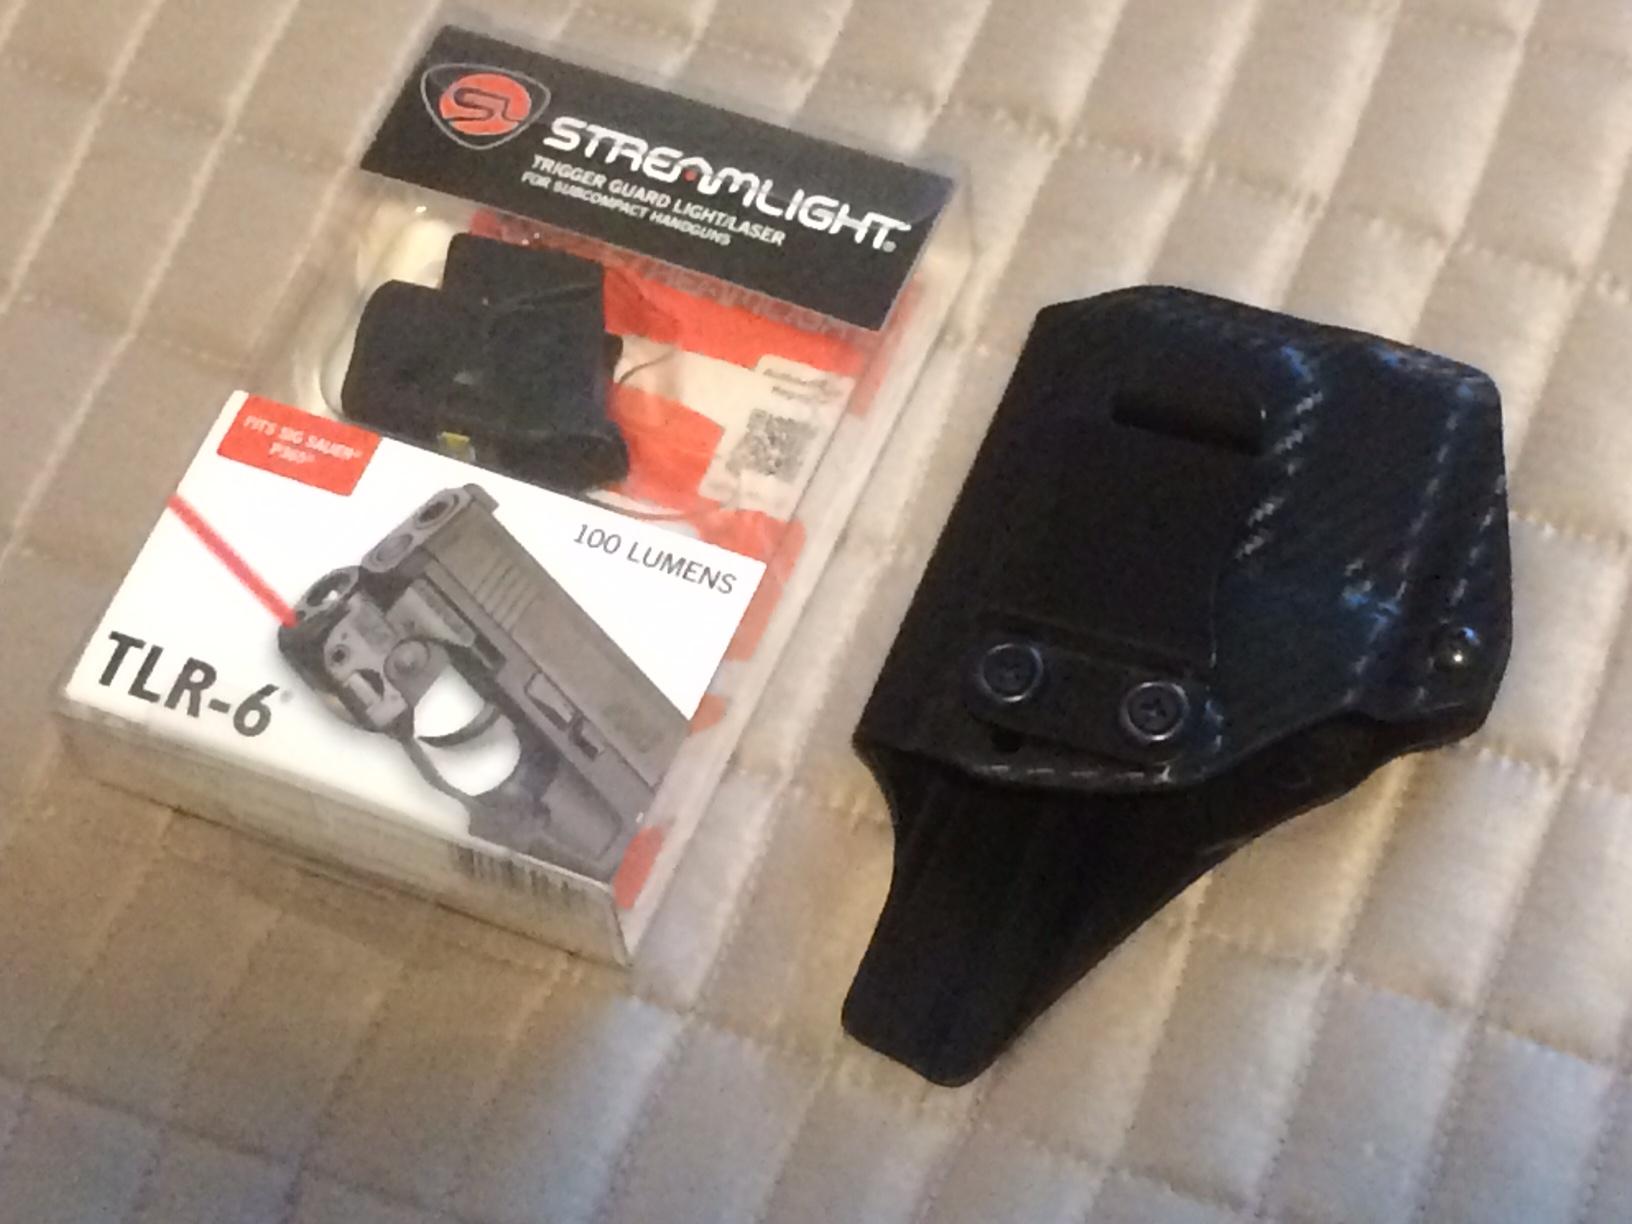 Streamlight TLR-6 and holster for Sig P365-sig-light-box.jpg